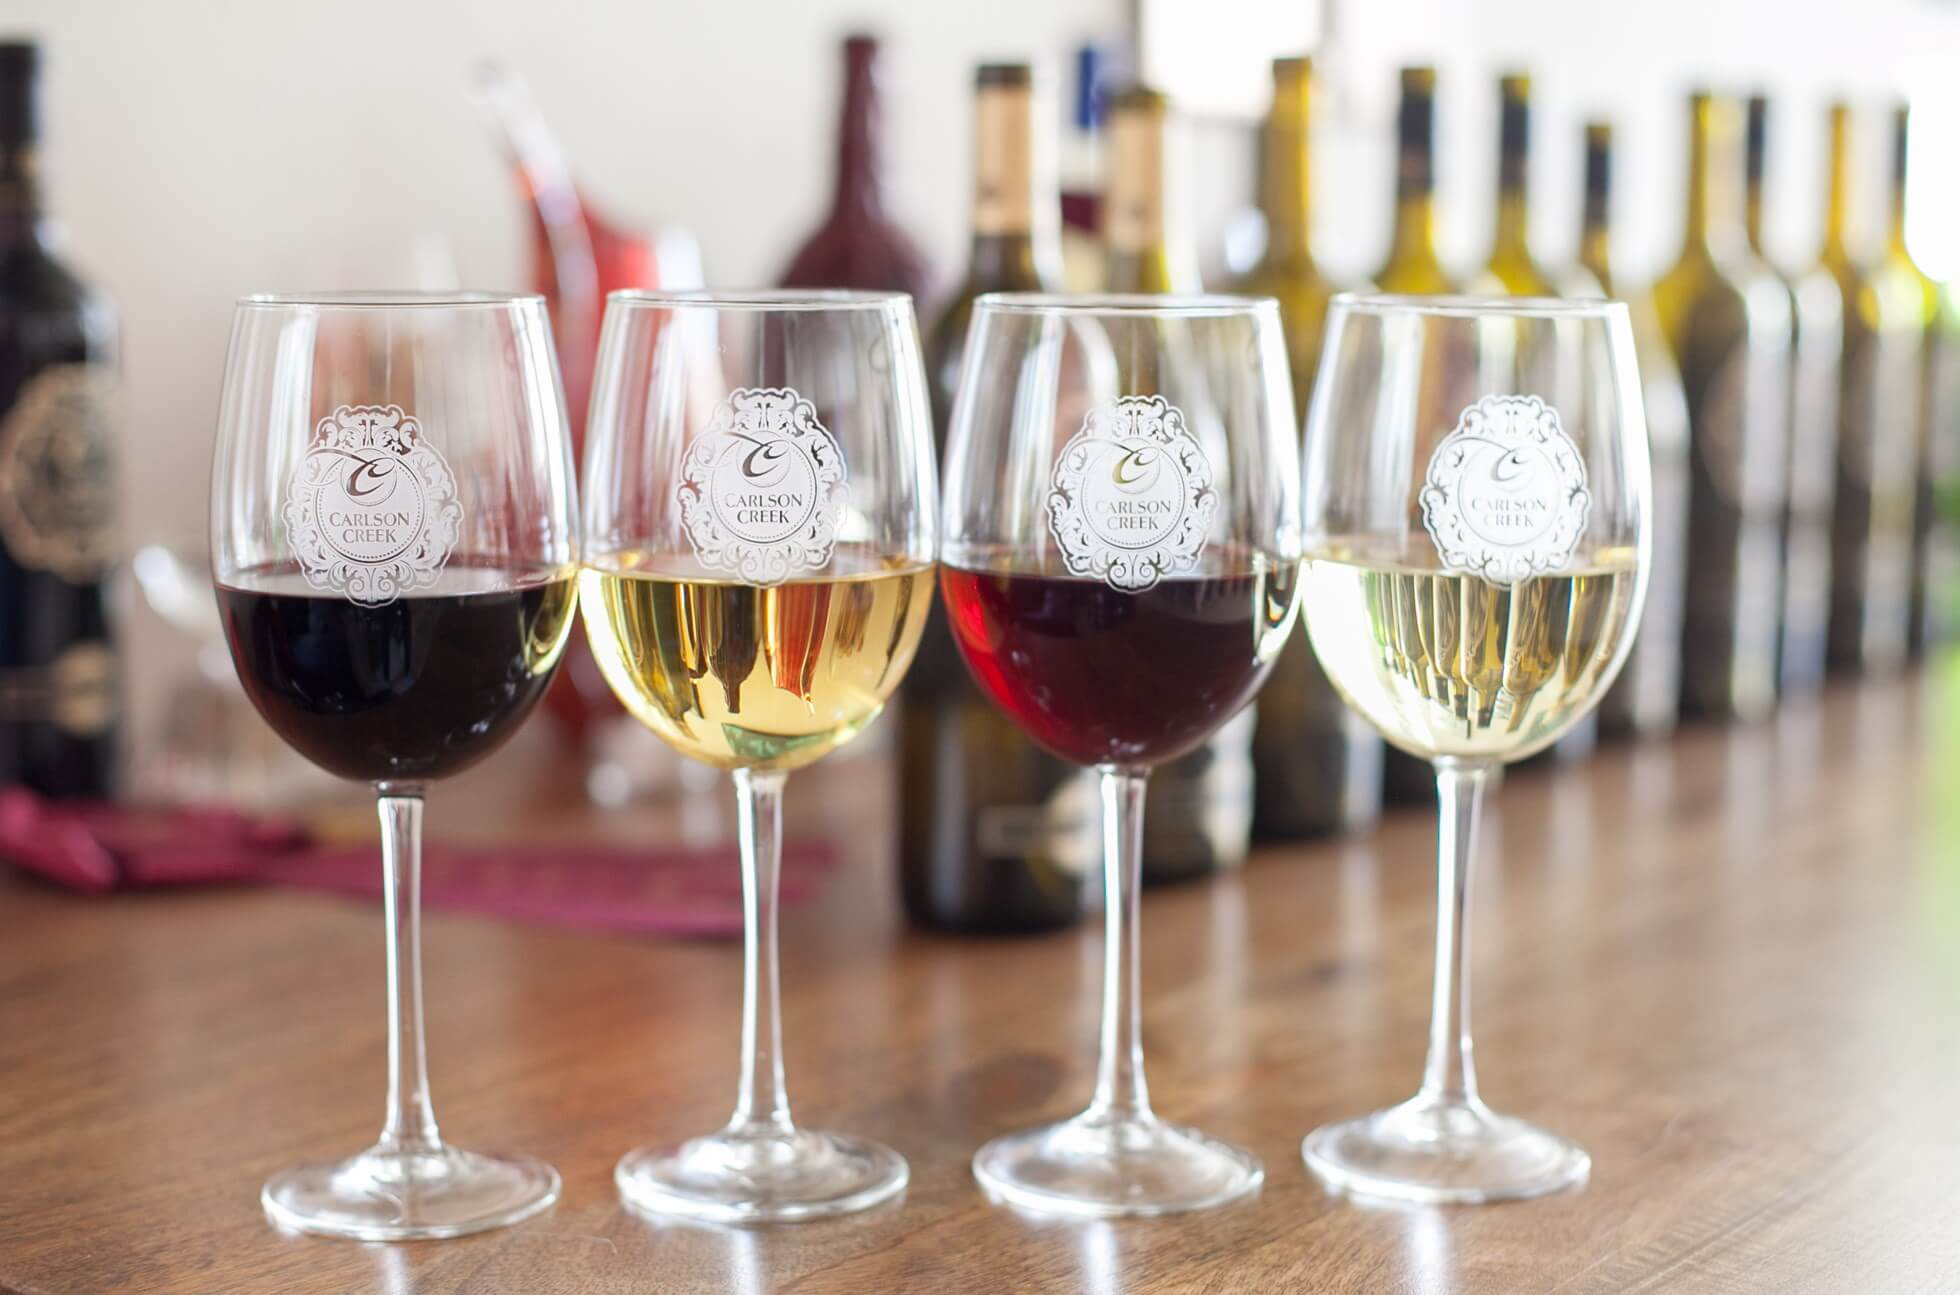 Carlson Creek Vineyard wine-tasting in Arizona